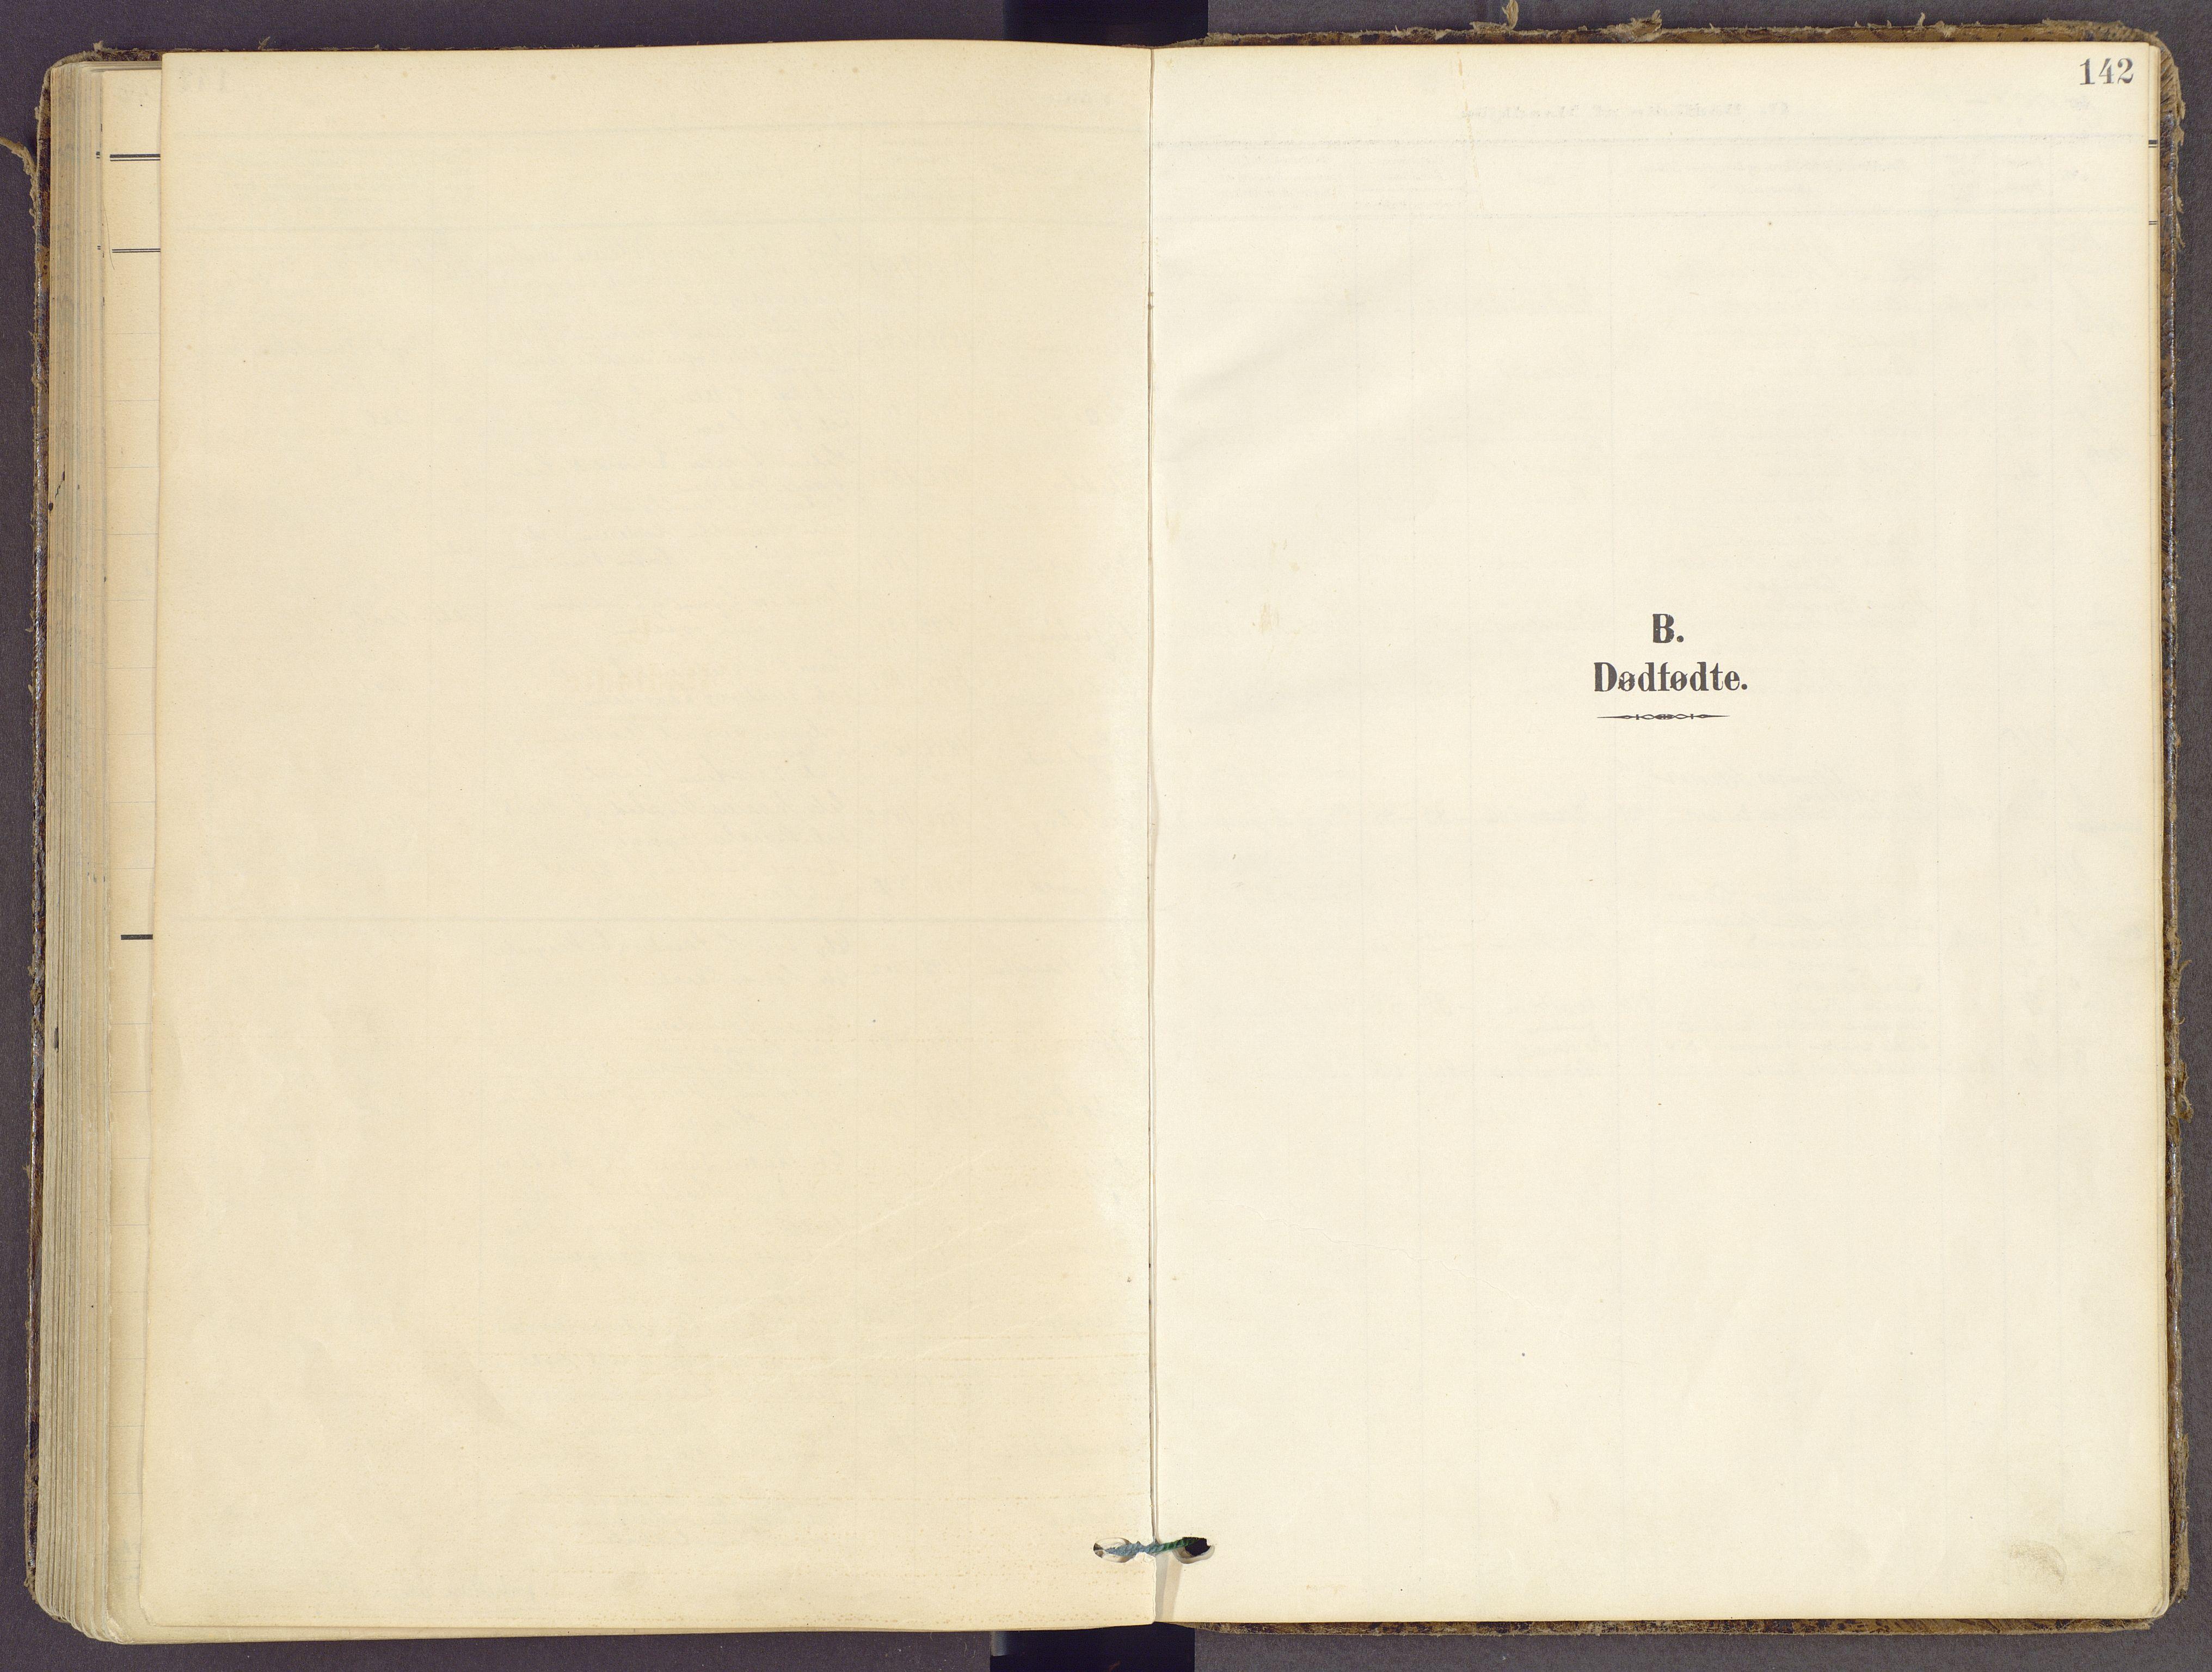 SAH, Gran prestekontor, Ministerialbok nr. 21, 1908-1932, s. 142